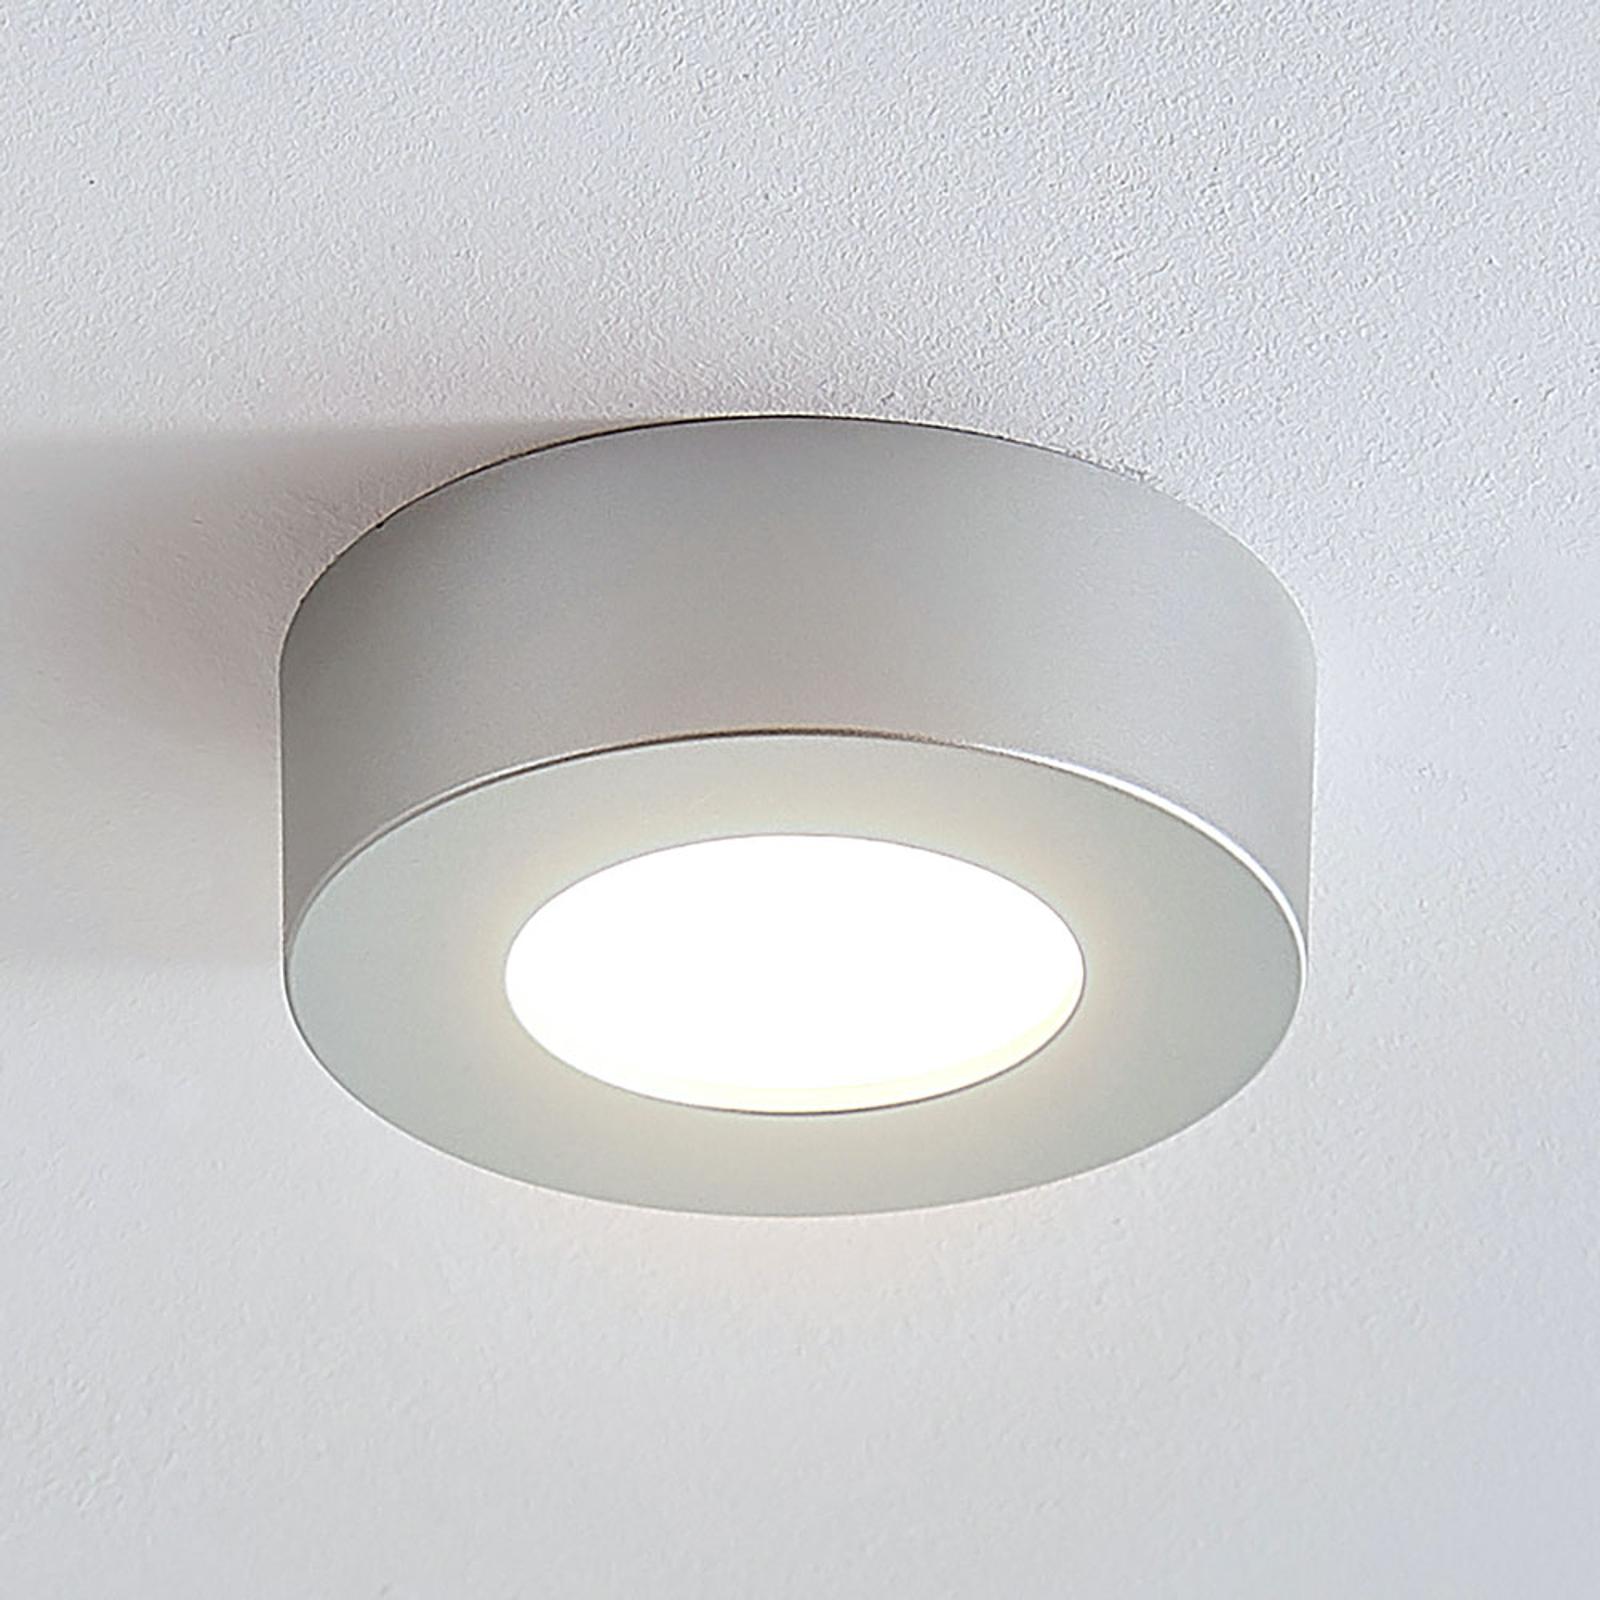 Marlo LED-loftlampe sølv 3000K rund 12,8cm